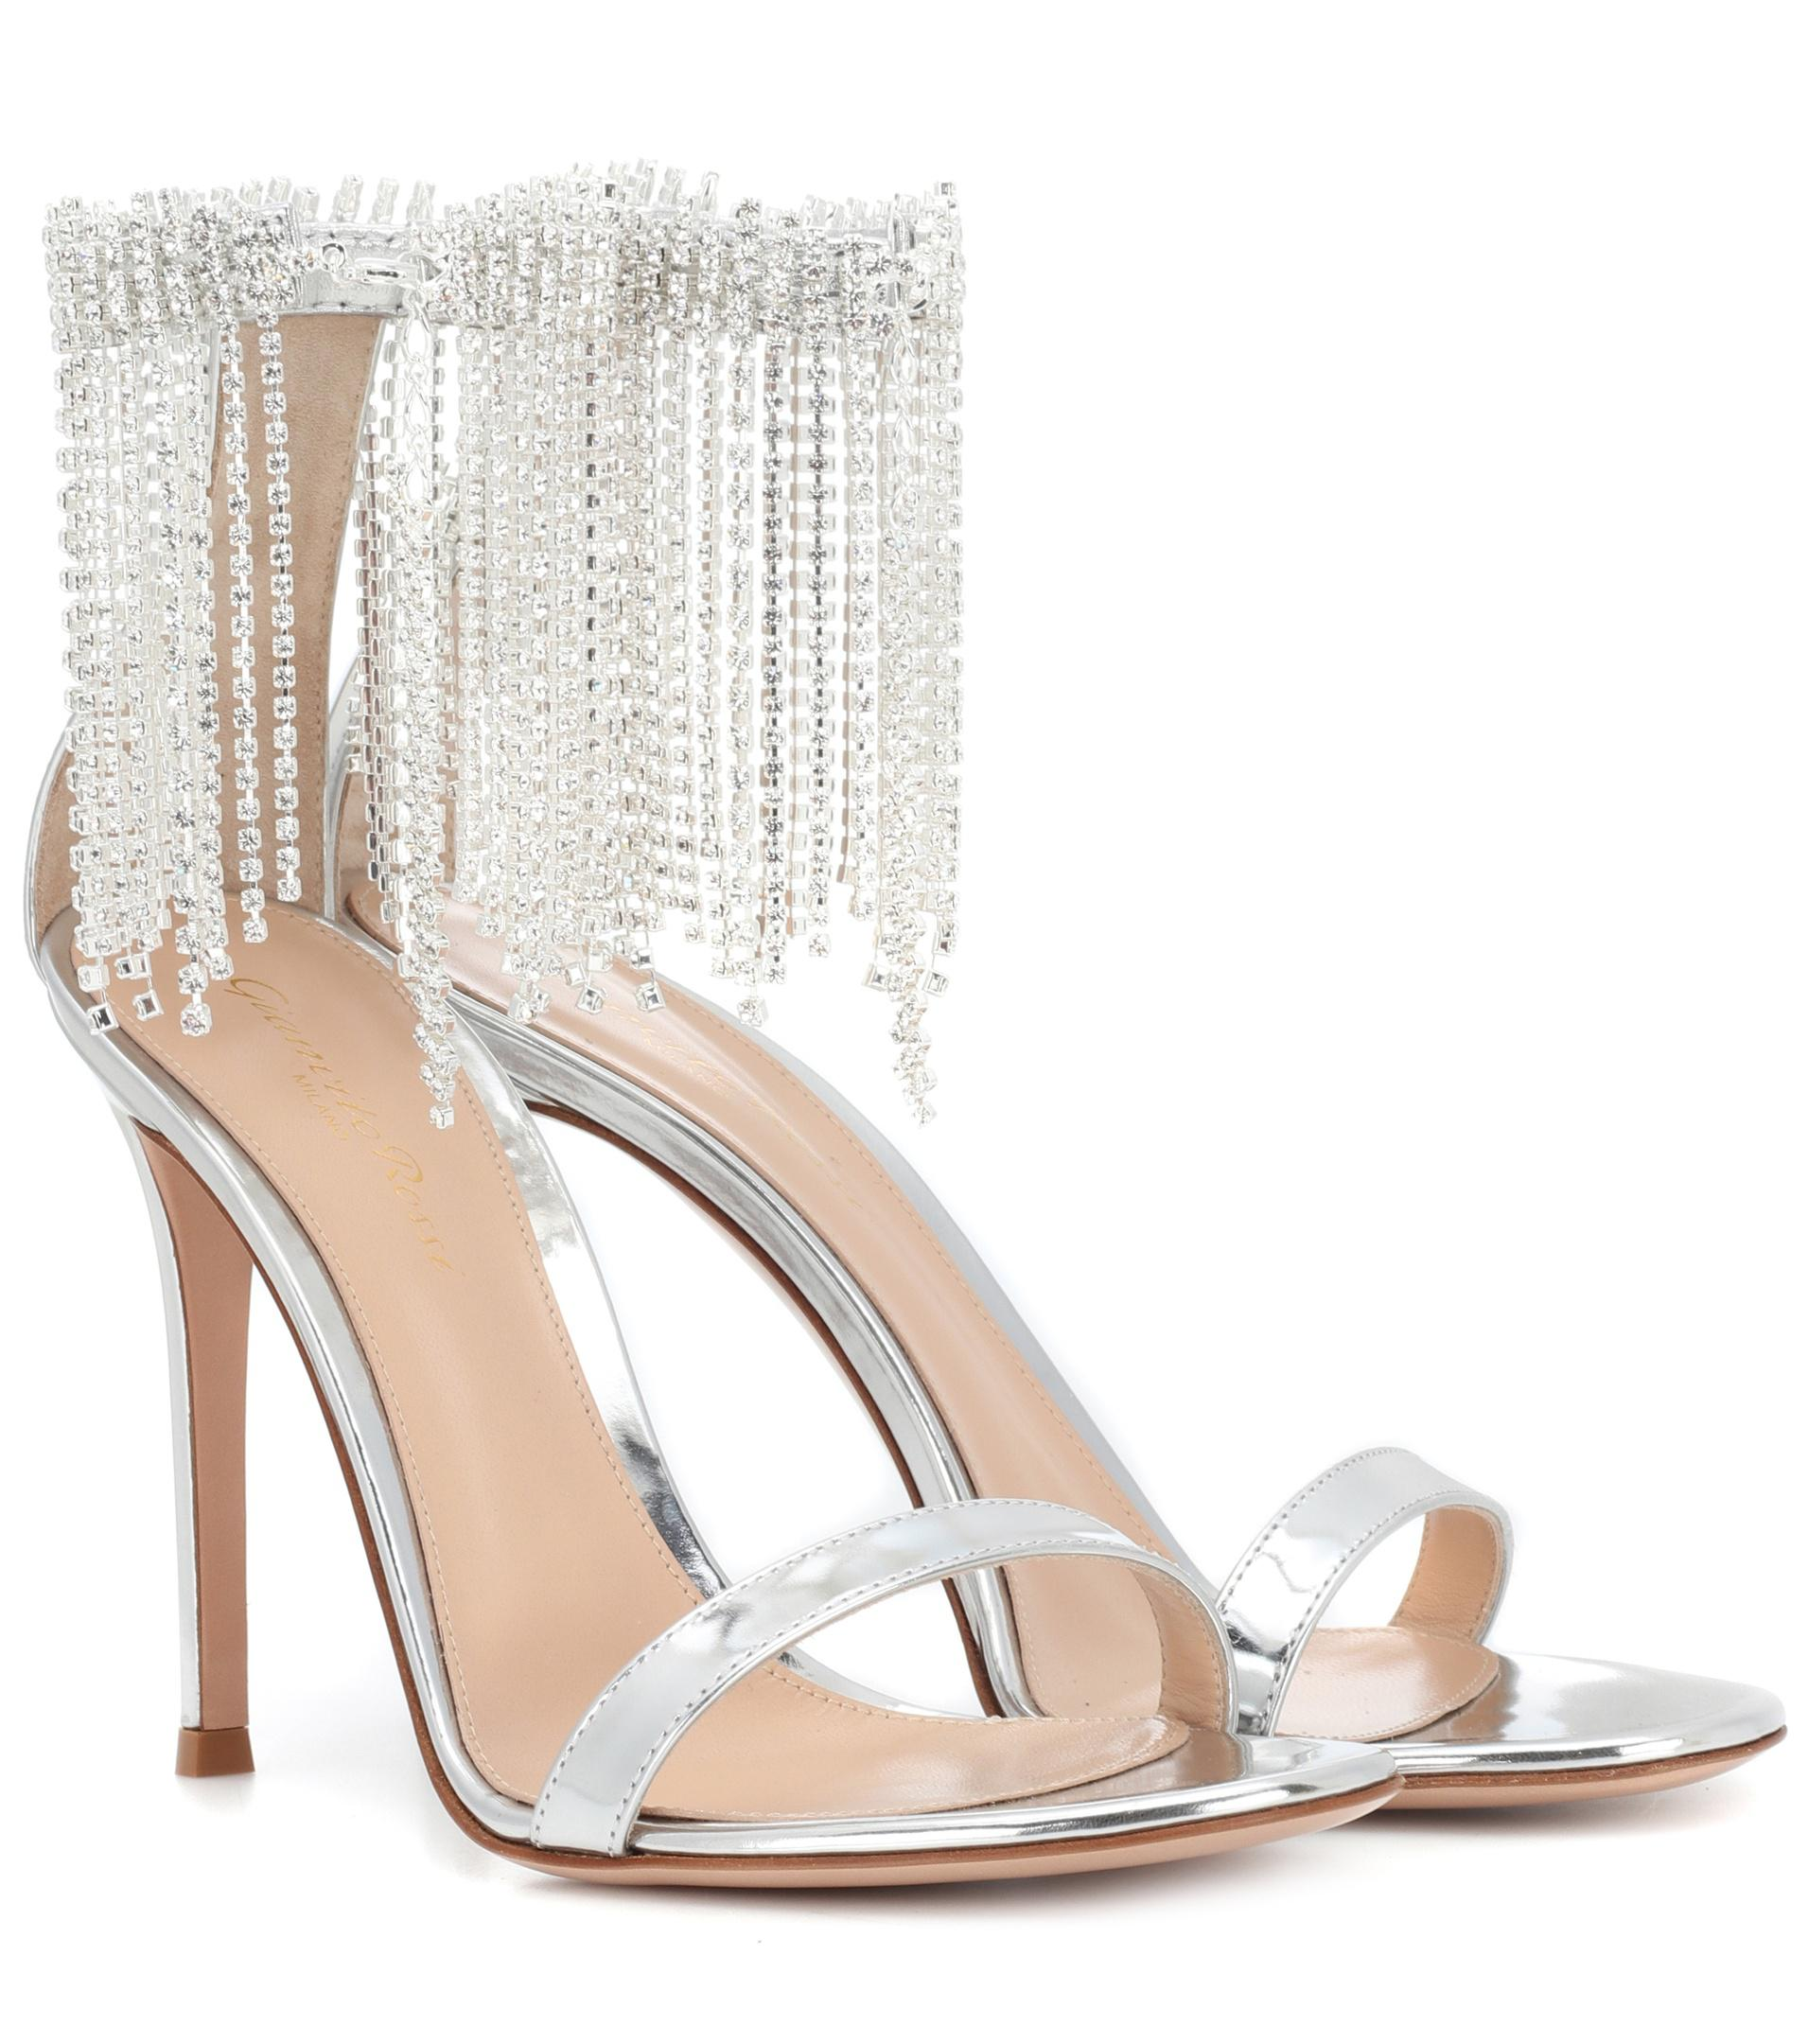 57fc08d7b902 Gianvito Rossi Jasmine 105 Metallic Leather Sandals in Metallic - Lyst